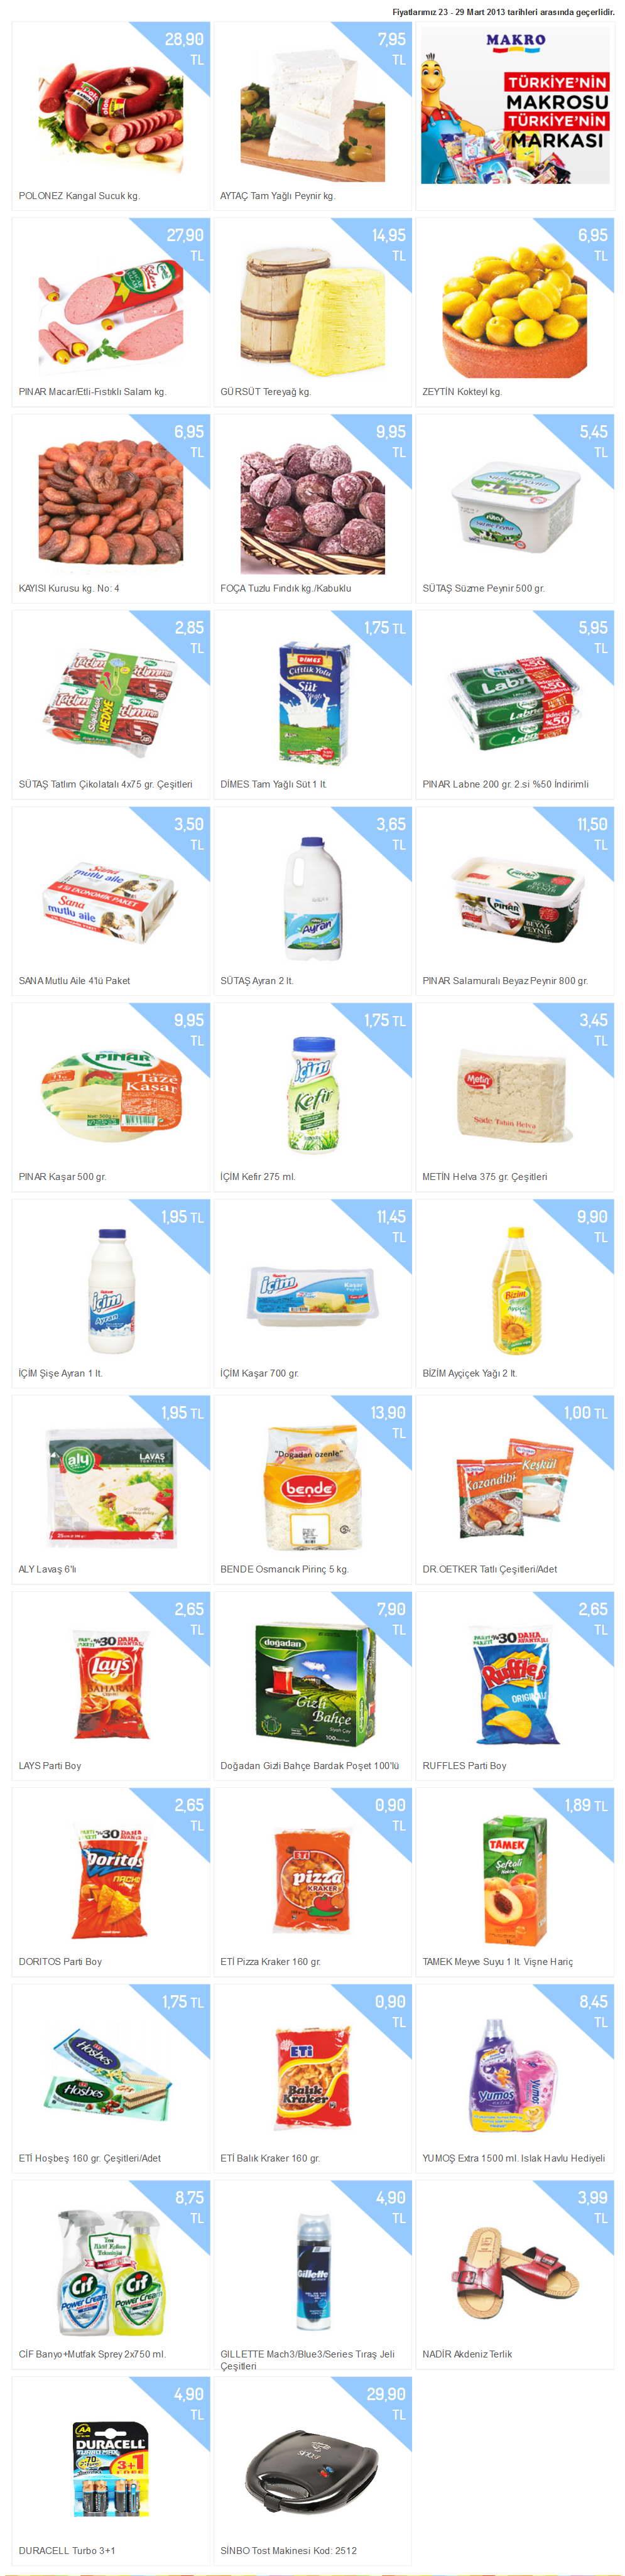 Makromarket - Promosyonlar_20130323